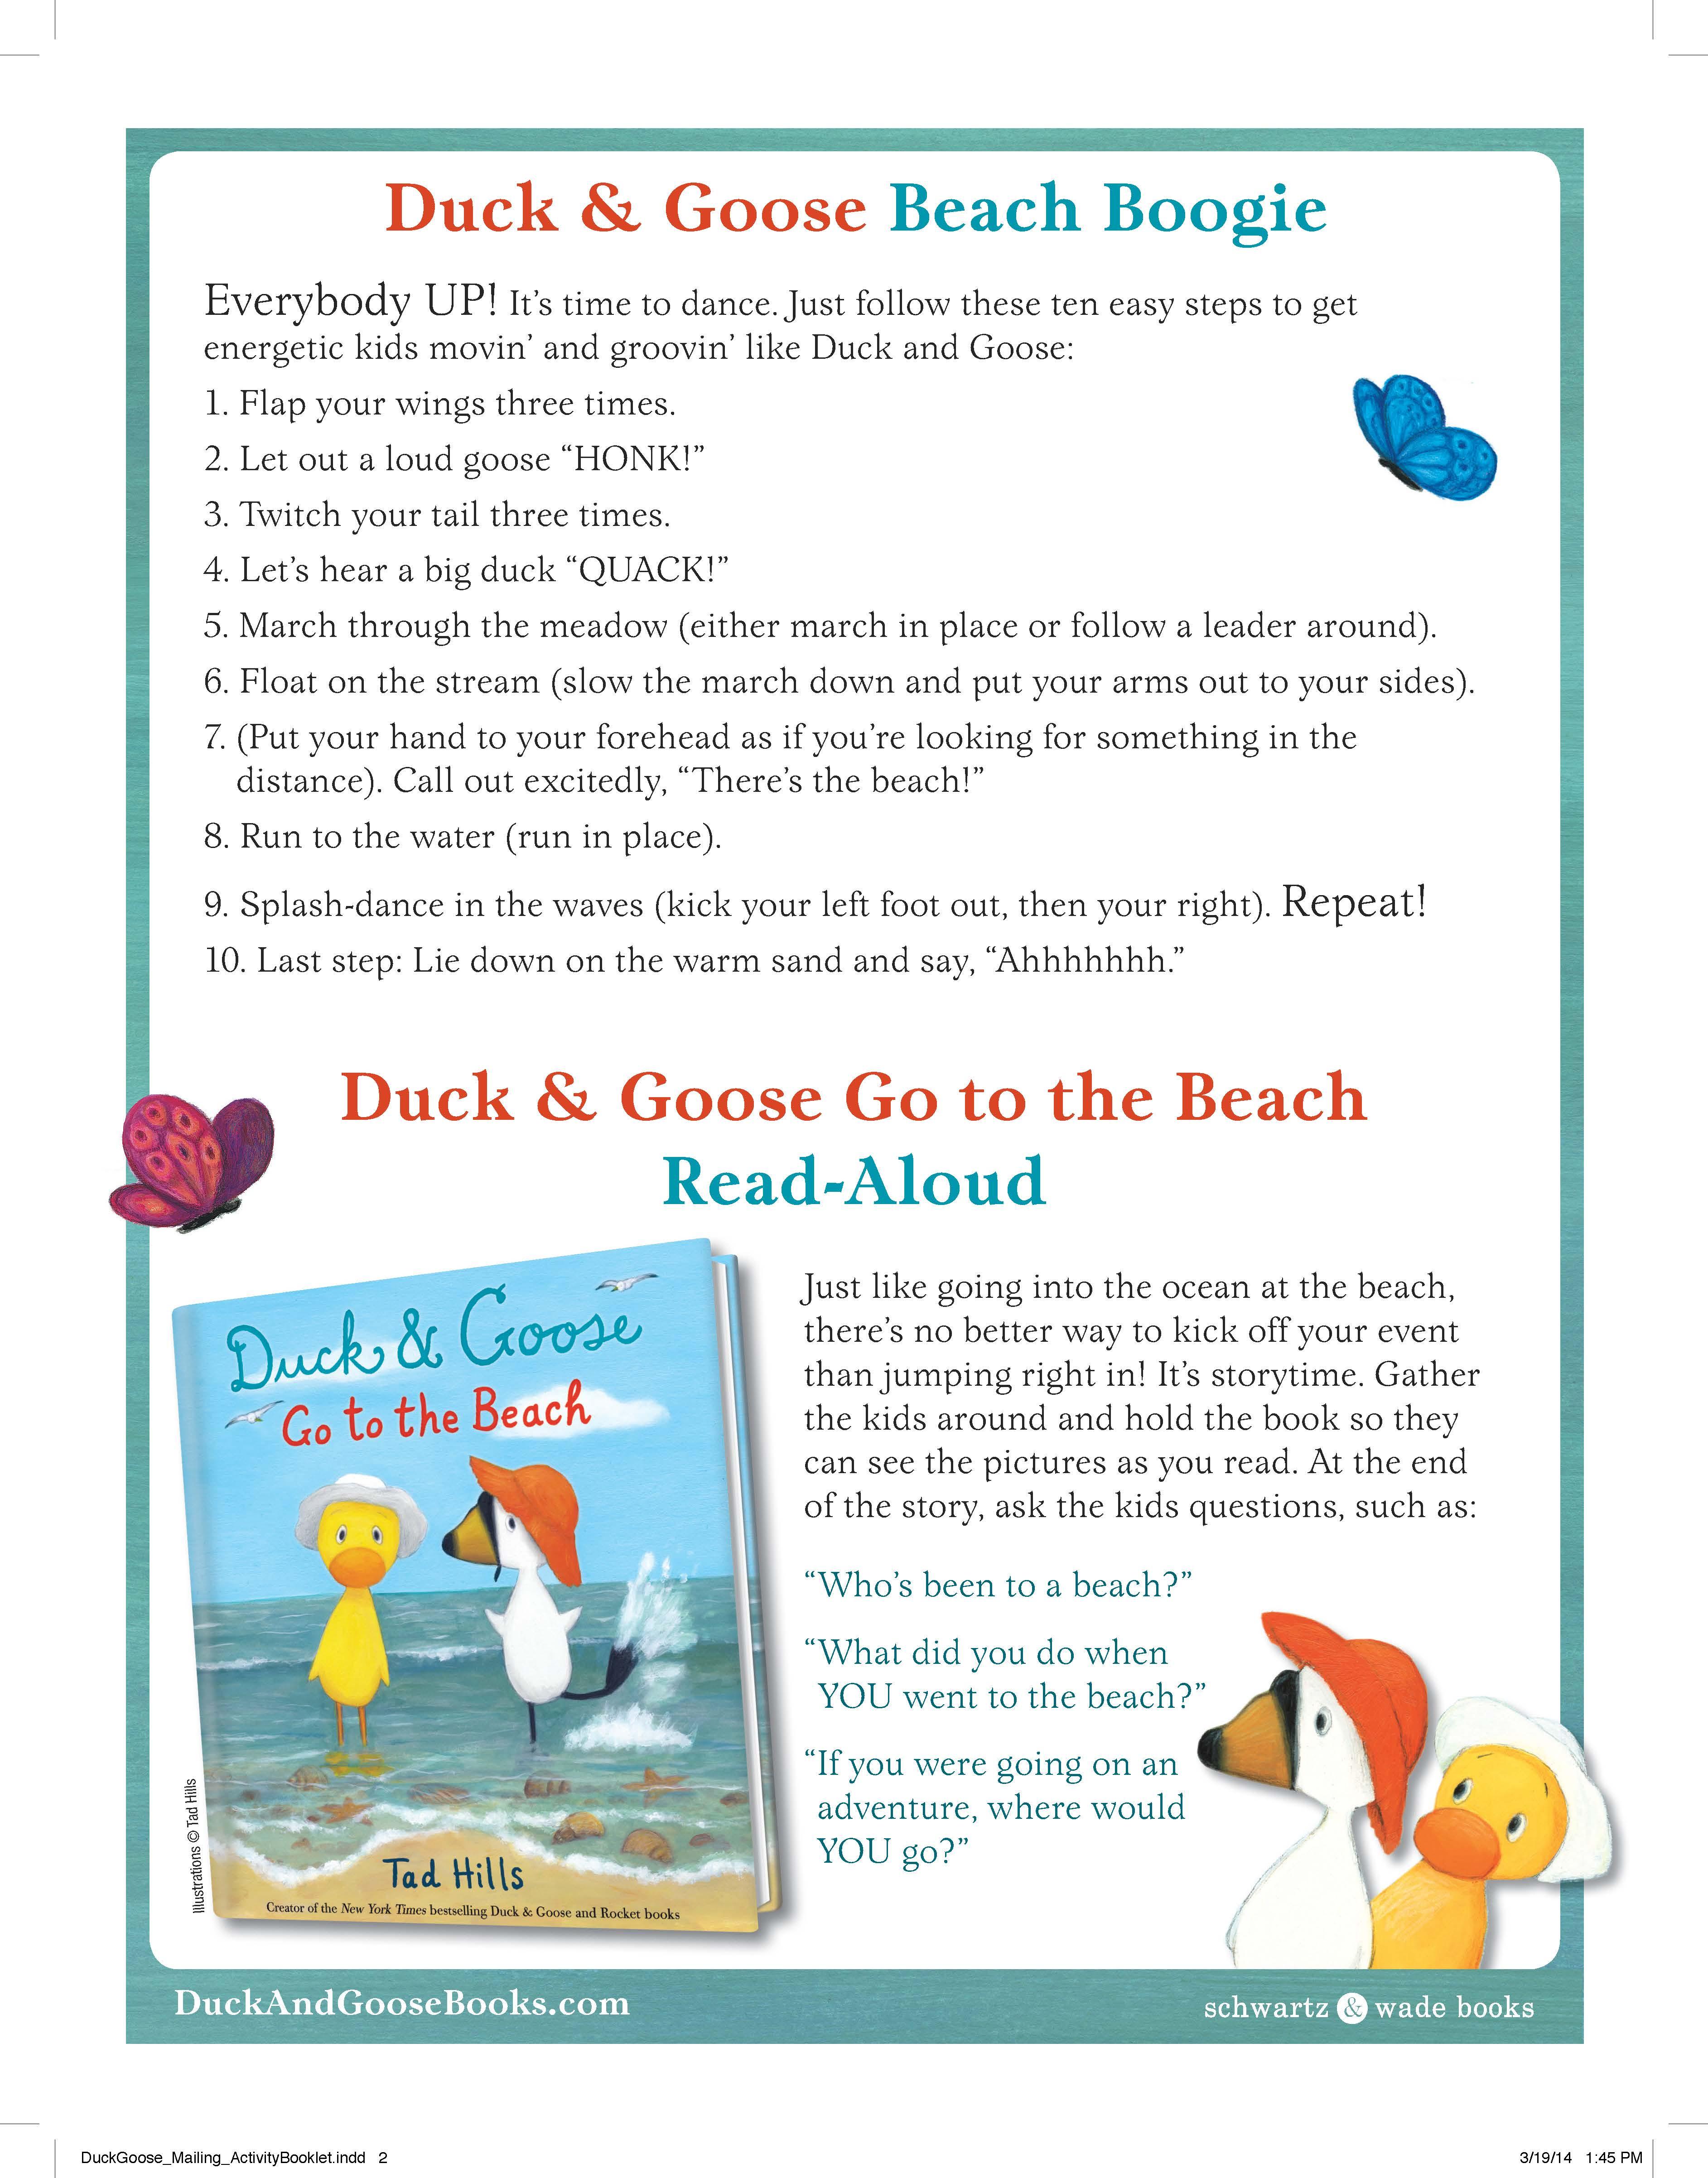 Duck & Goose Beach Boogie Activity